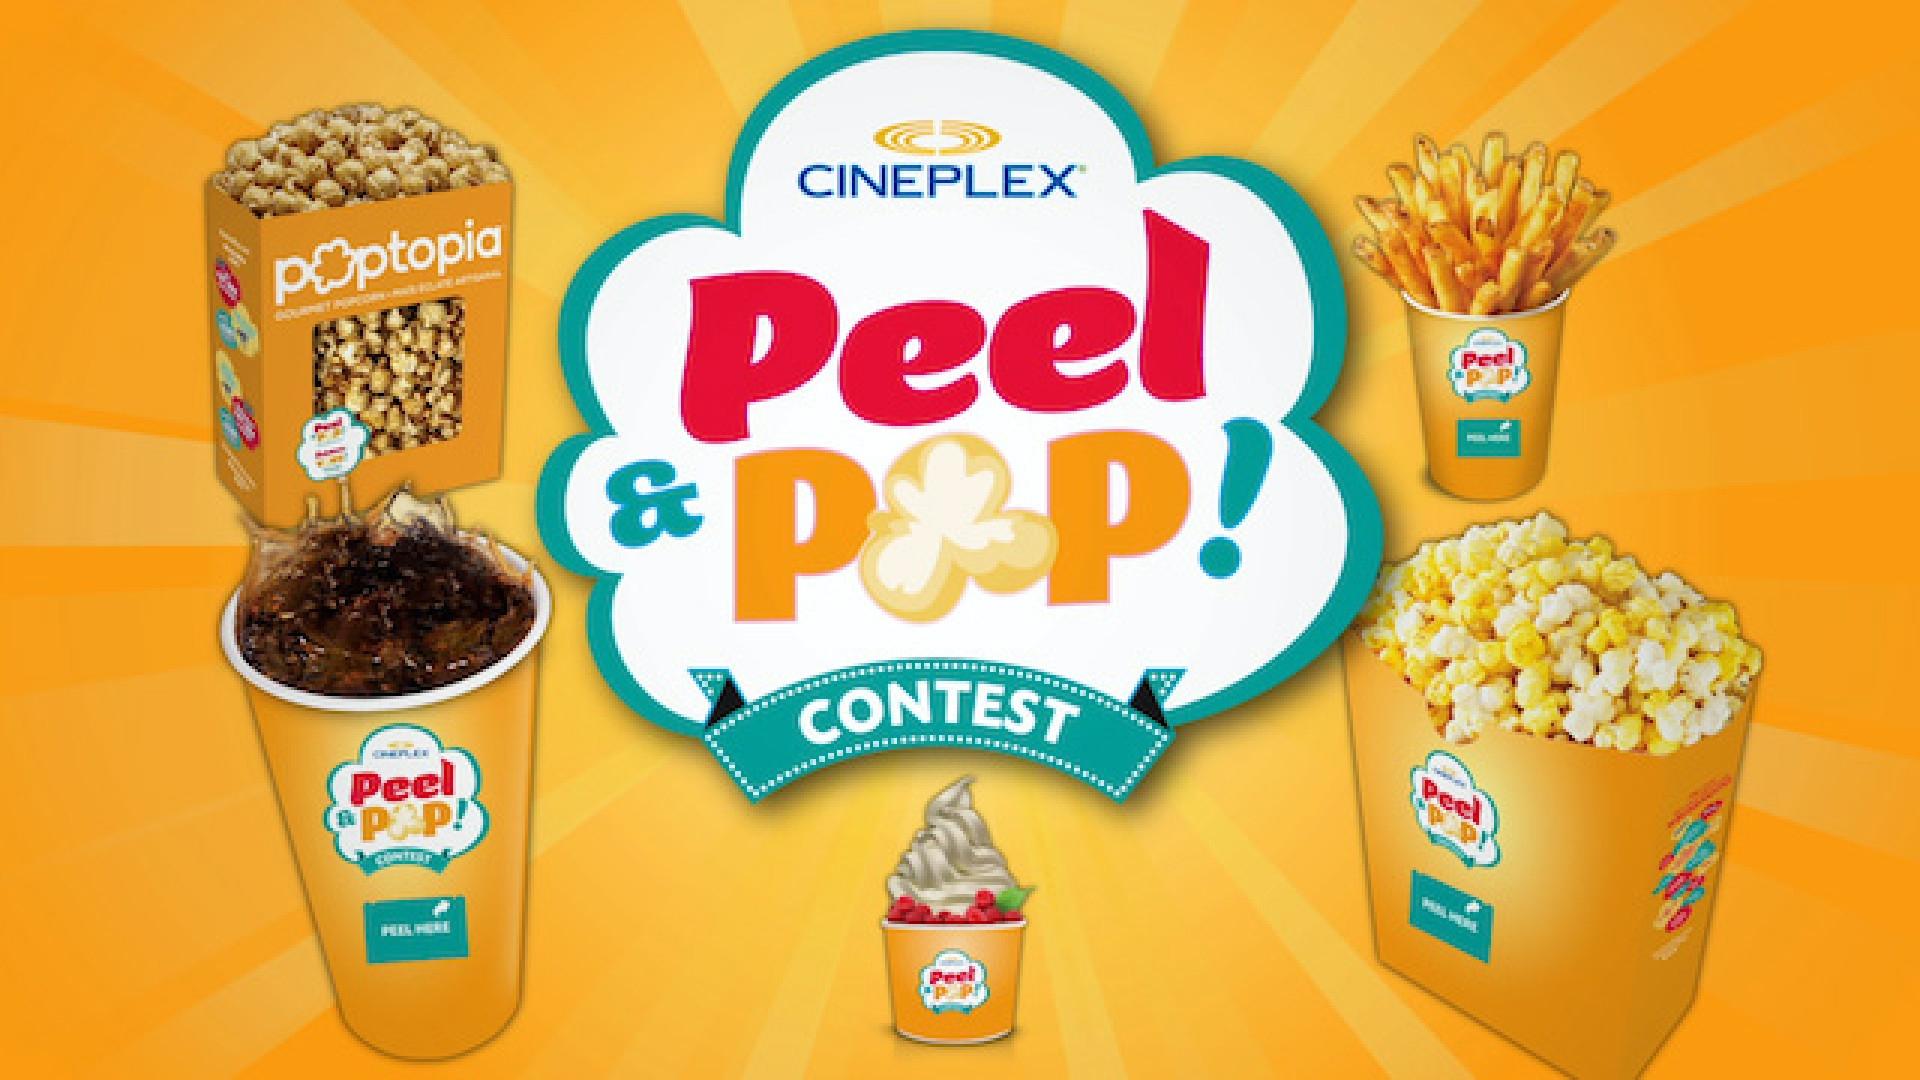 Peel & Pop!